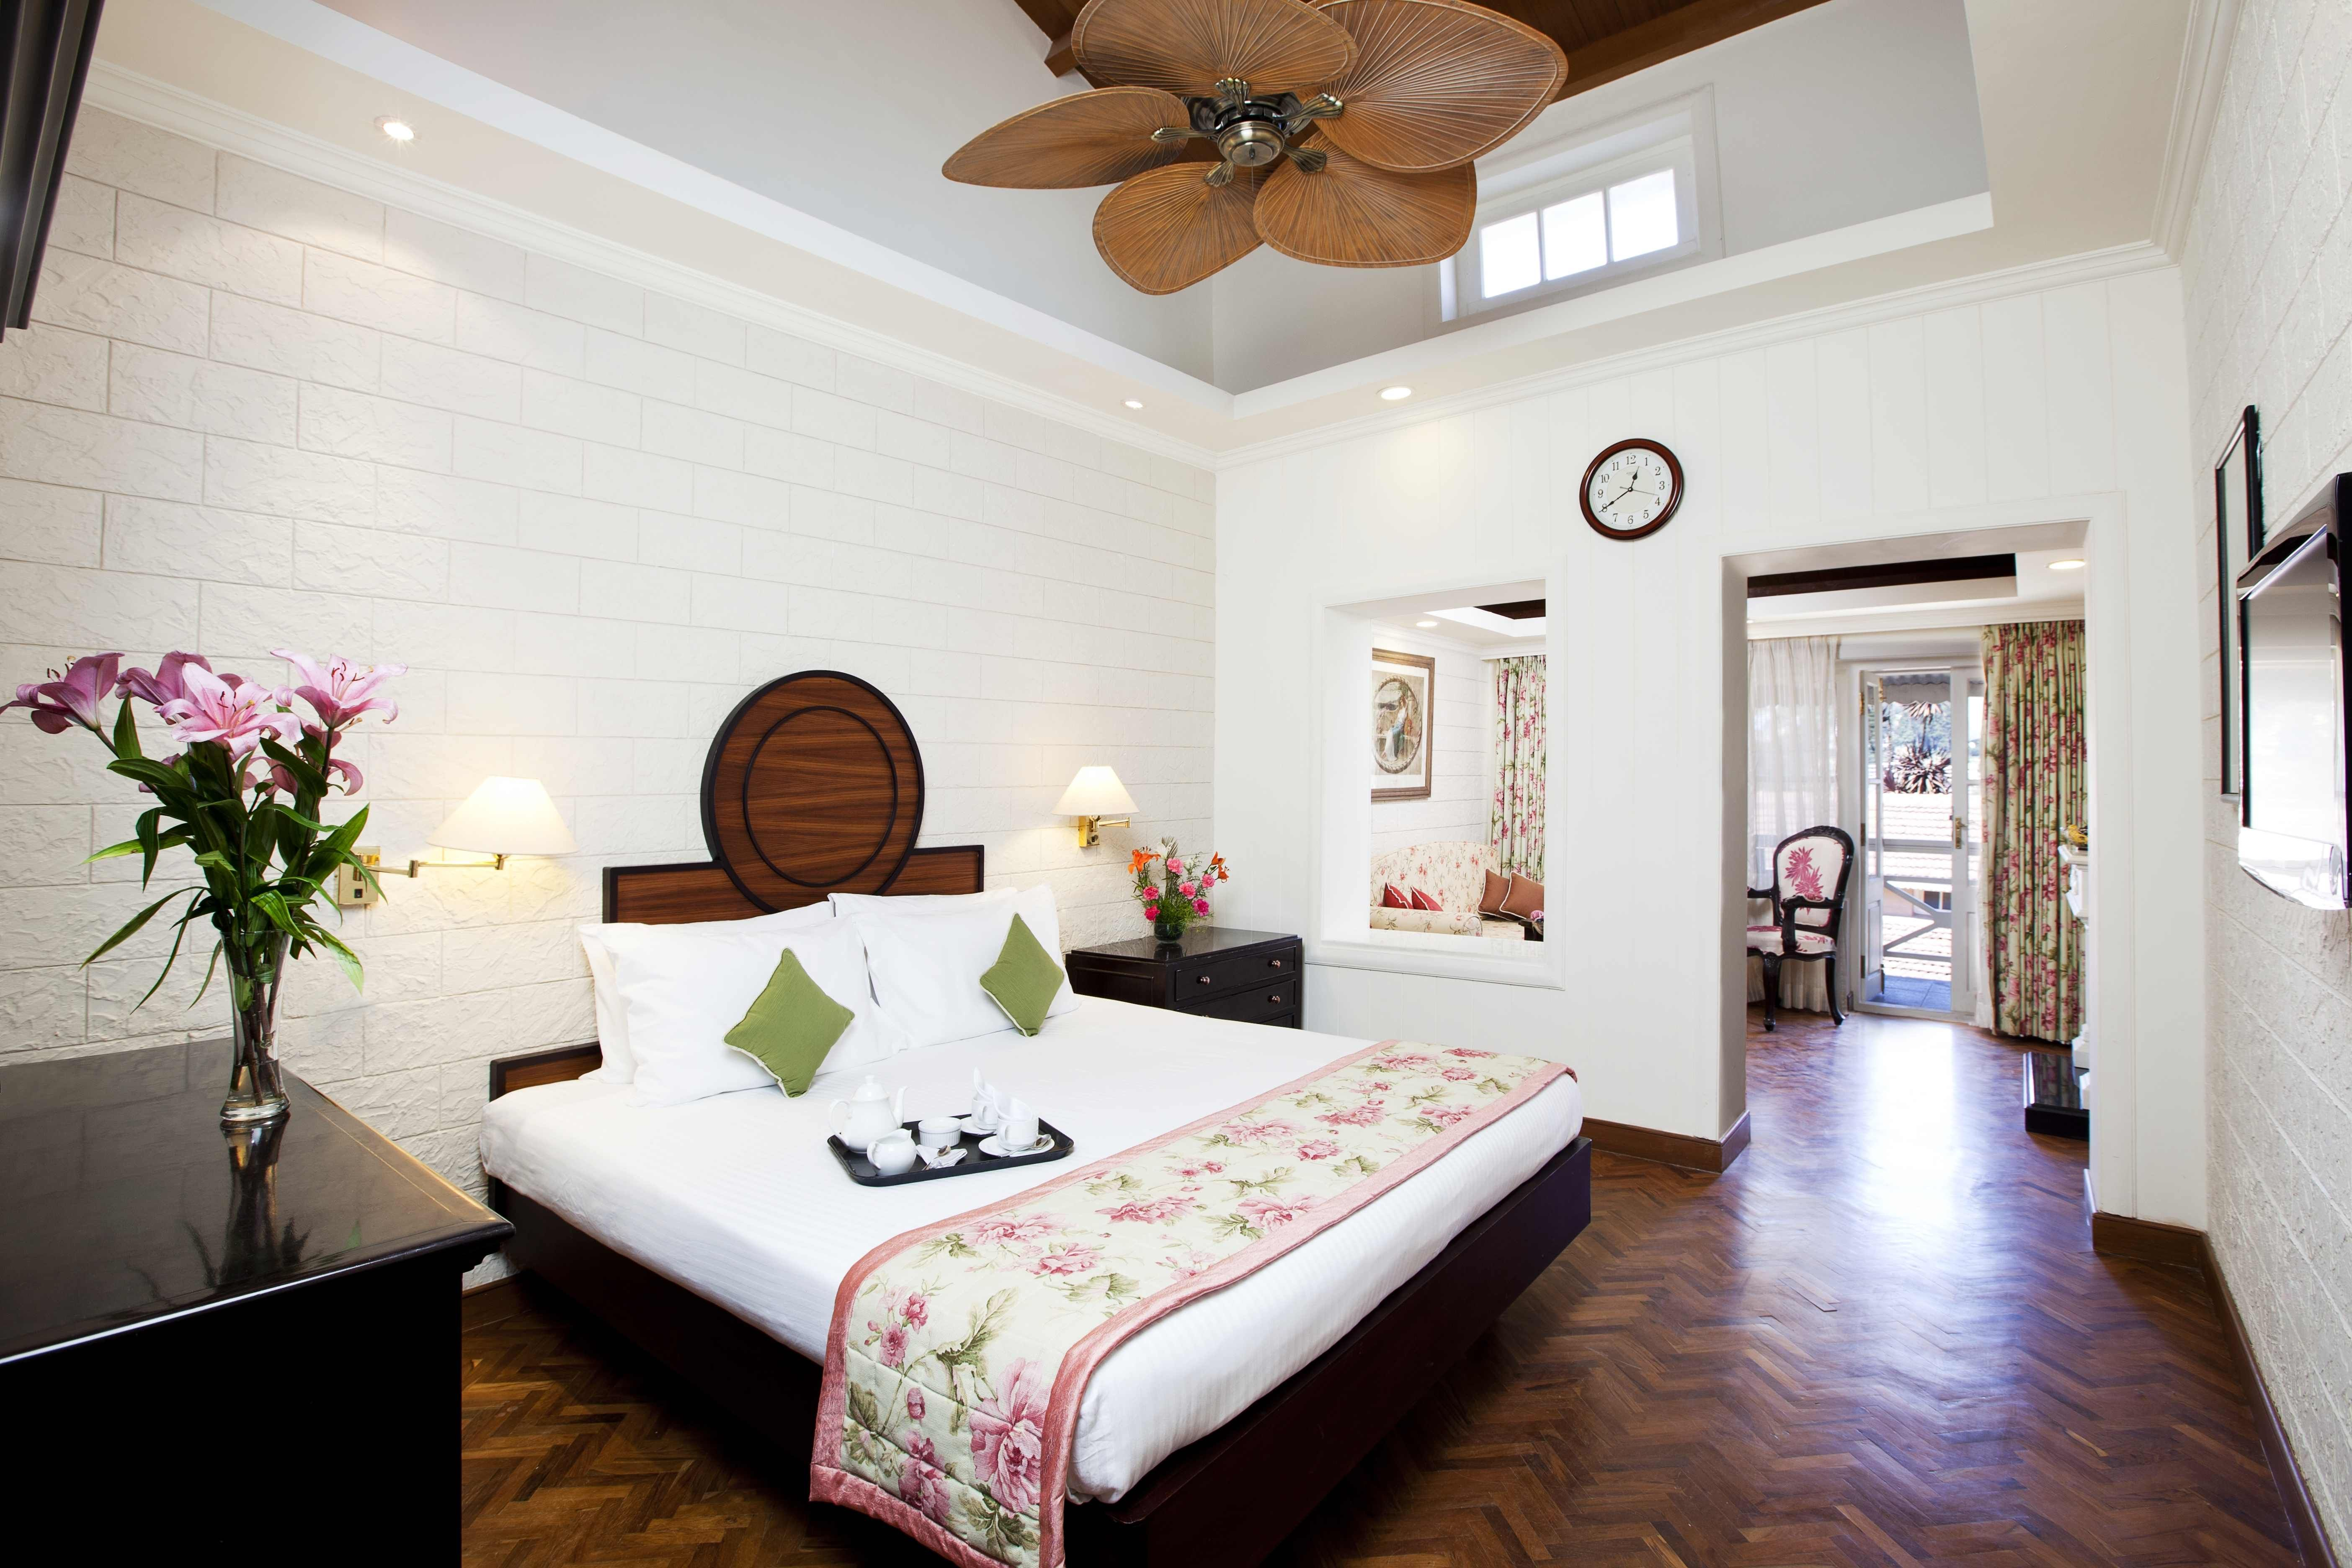 16 Club Mahindra Derby Green Ooty Ideas Ooty Green Resort Derby